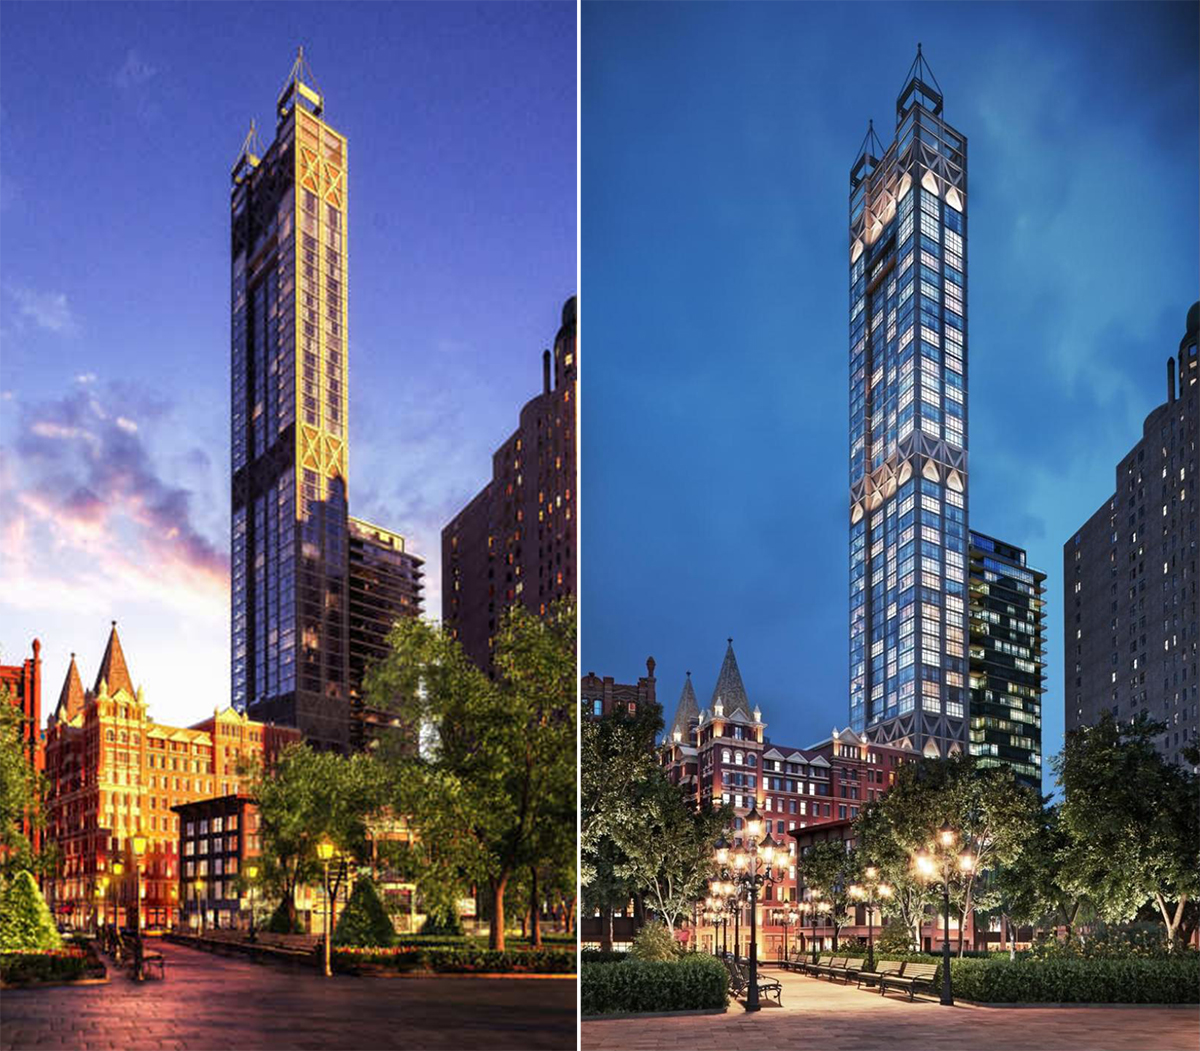 Beekman Residences, Gerner Kronick Valcarcel, Manhattan towers, NYC Developments, Fidi condos, GKV Architects, Newspaper Row, Skyscrapers